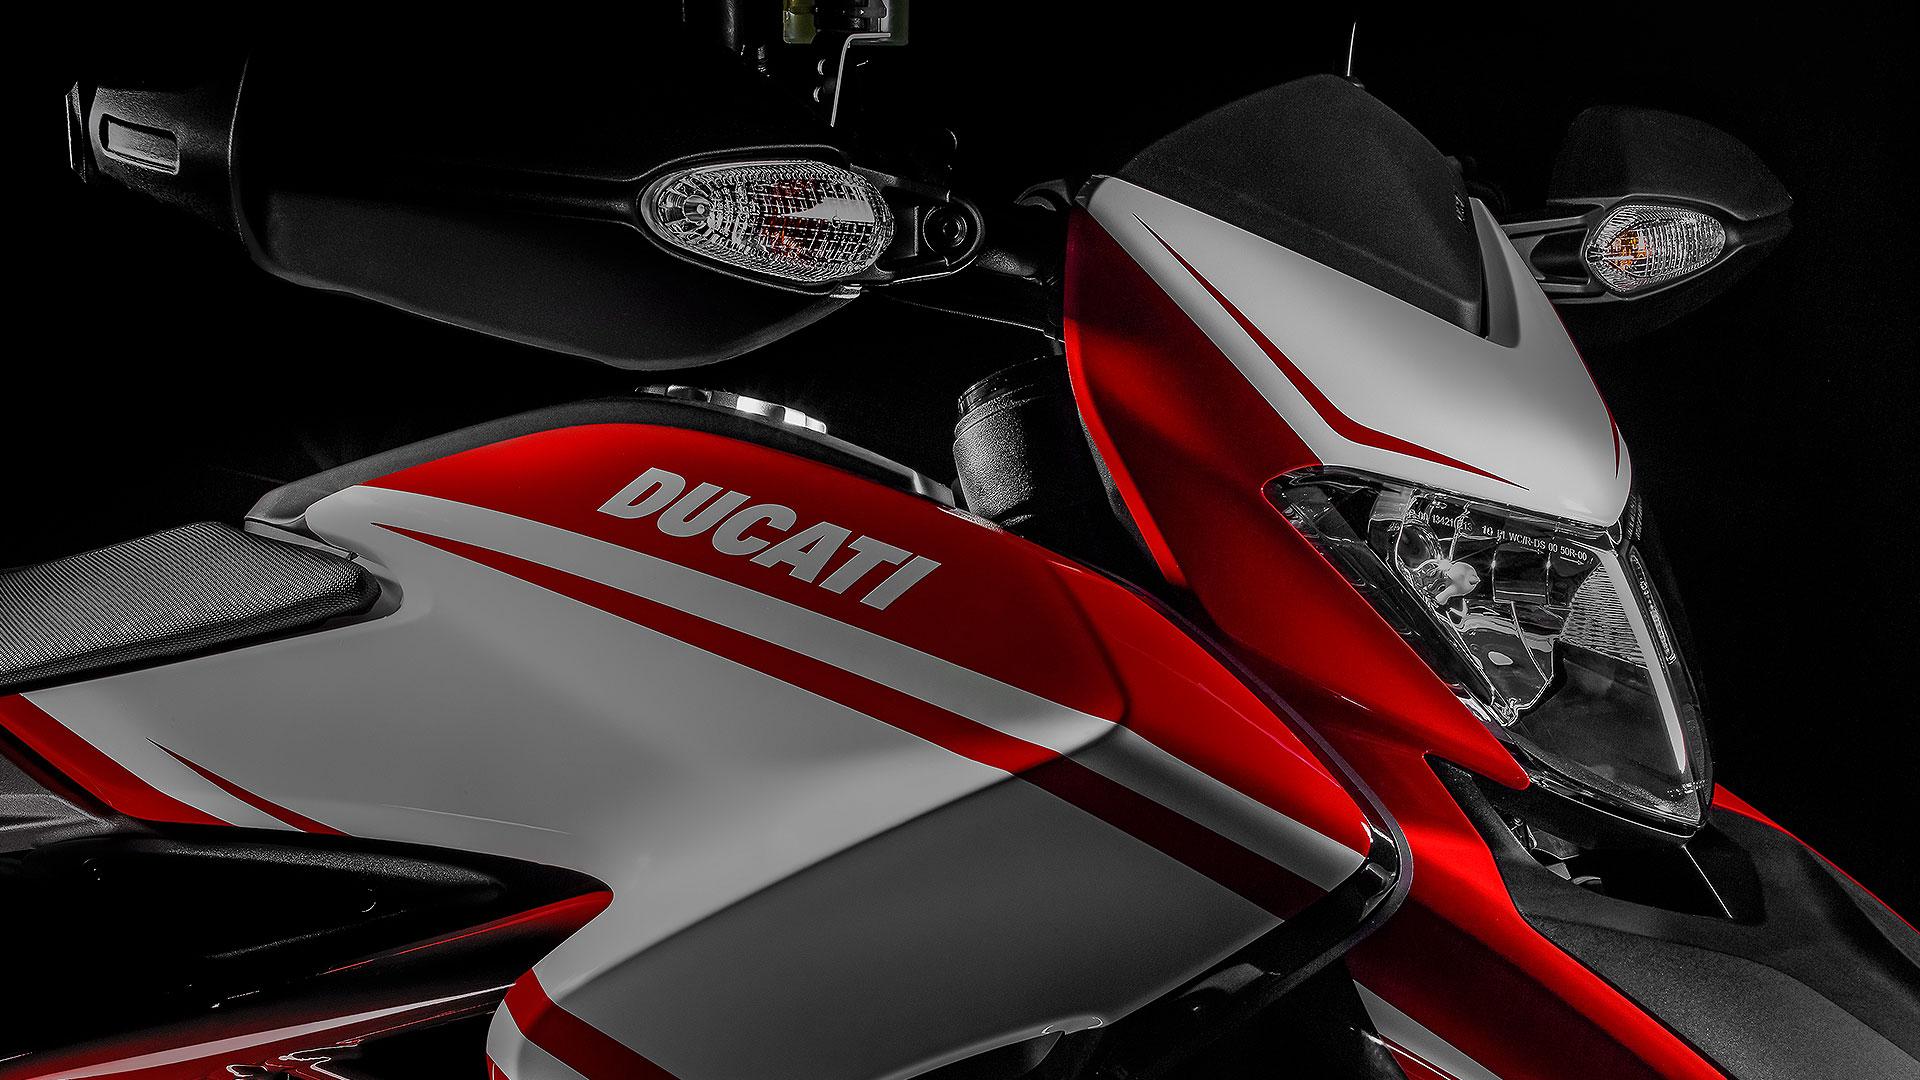 Ducati Hypermotard 821 2015 STD